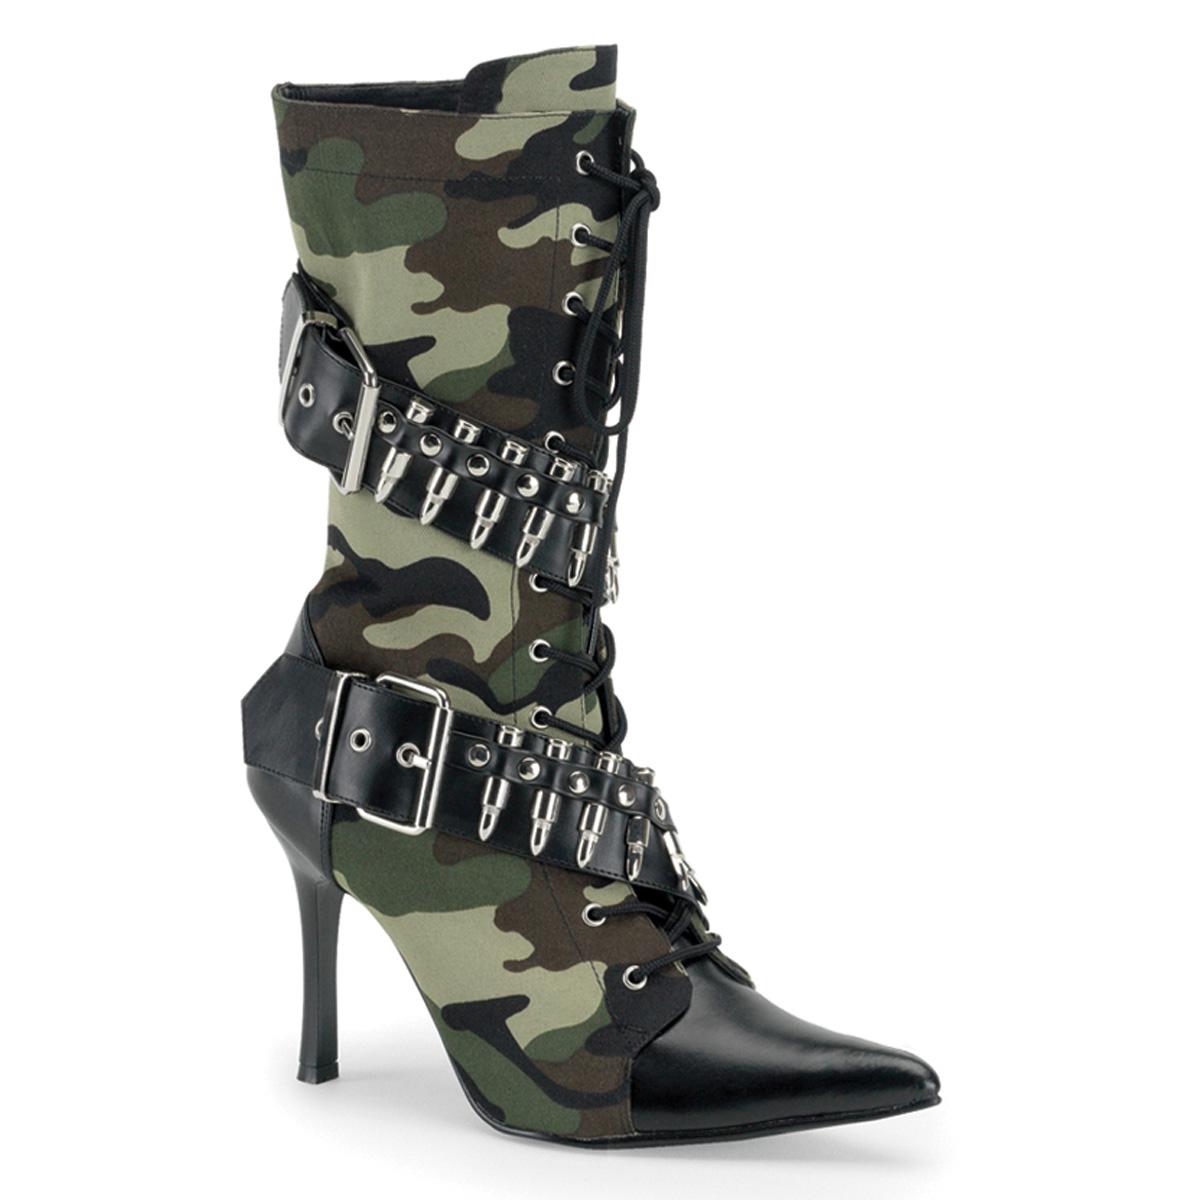 Par Sexy Collection Chaussures Patriot Funtasma Chaussureland UpgnqS